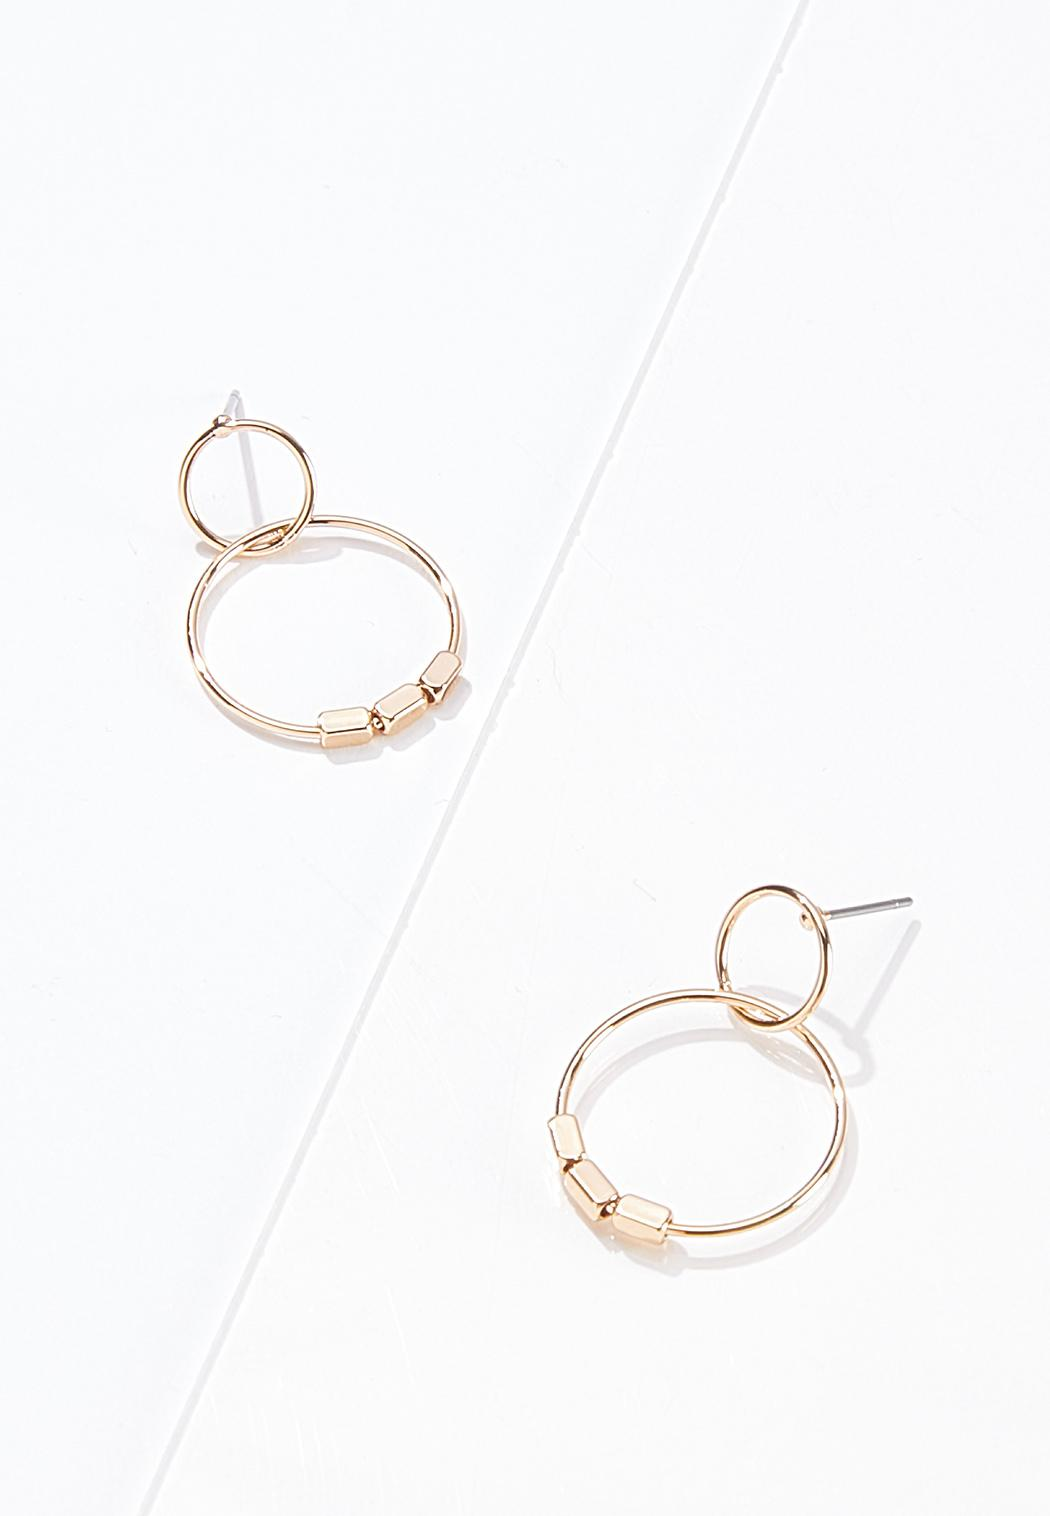 Delicate Door Knocker Earrings